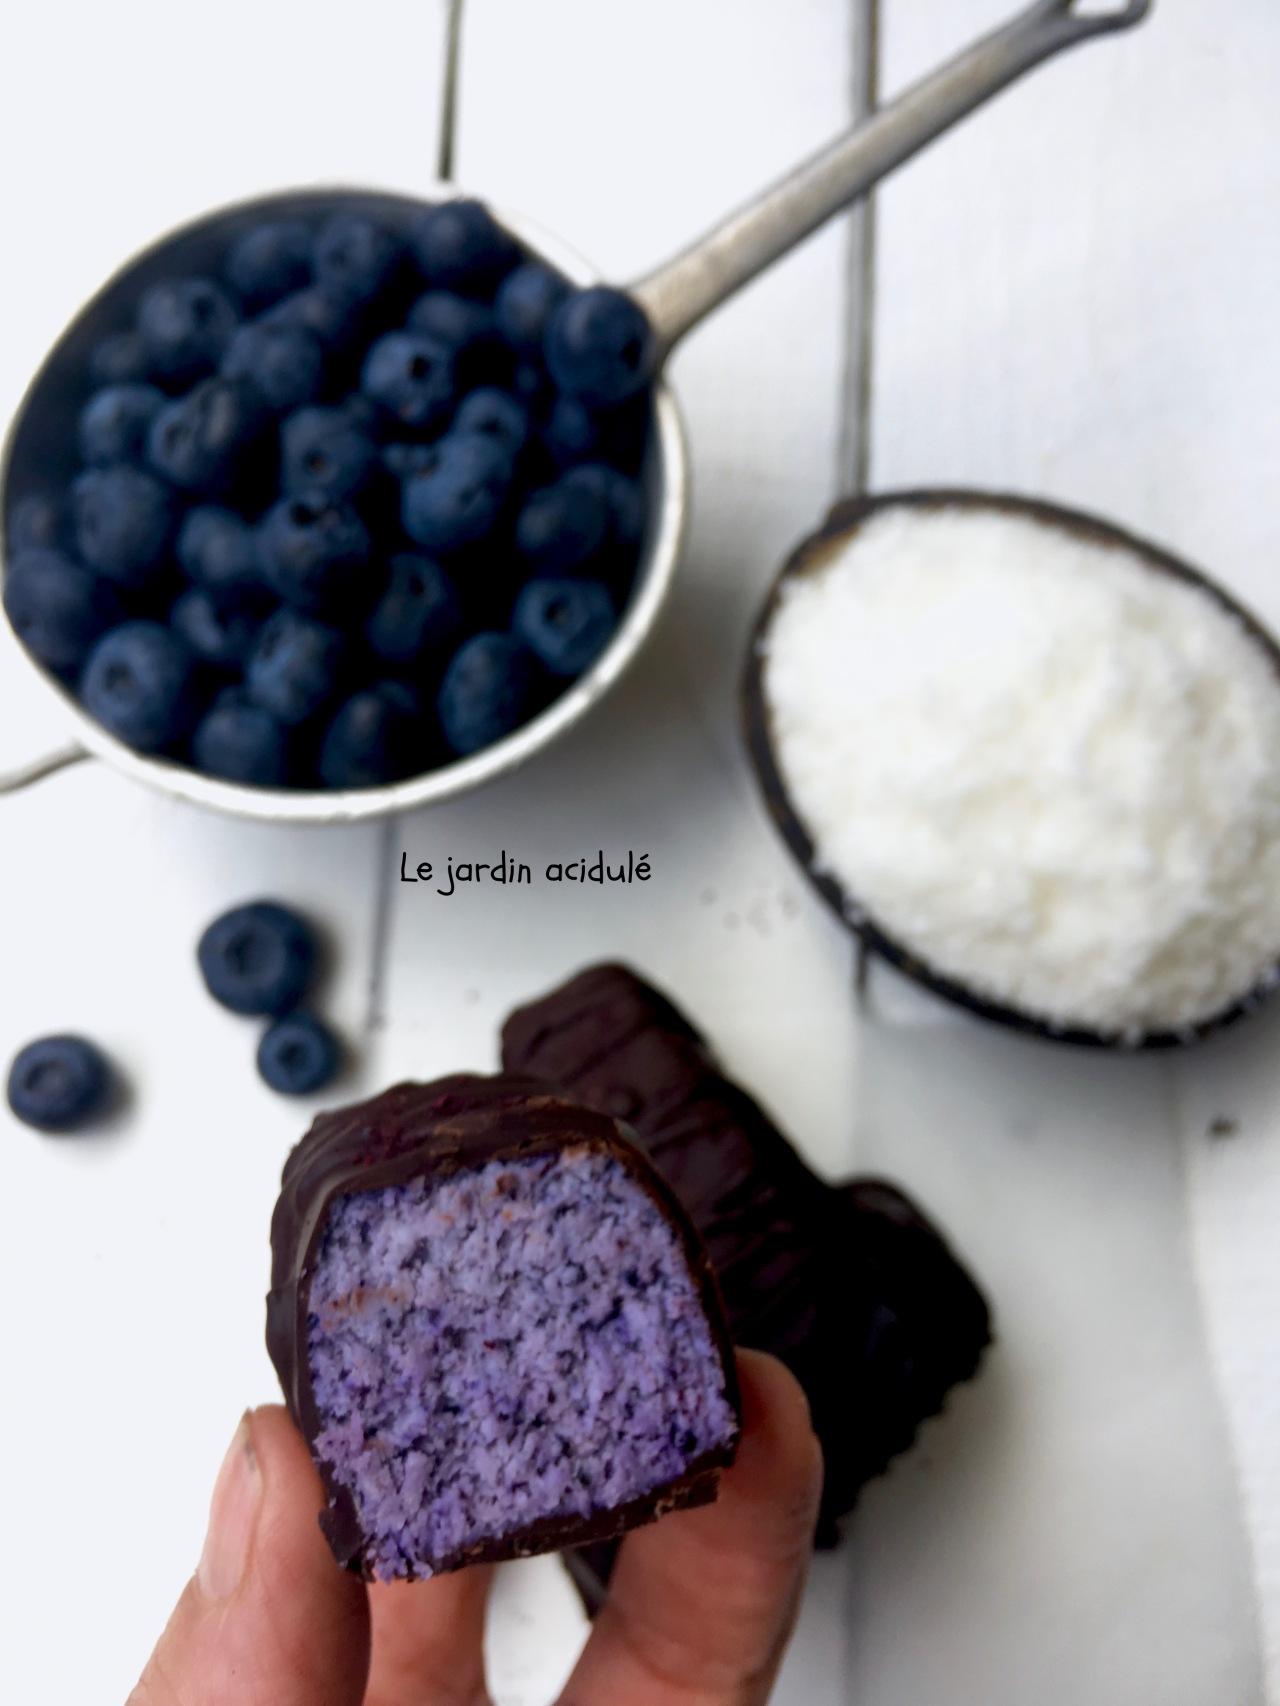 Blueberry Bounty_3480.jpg